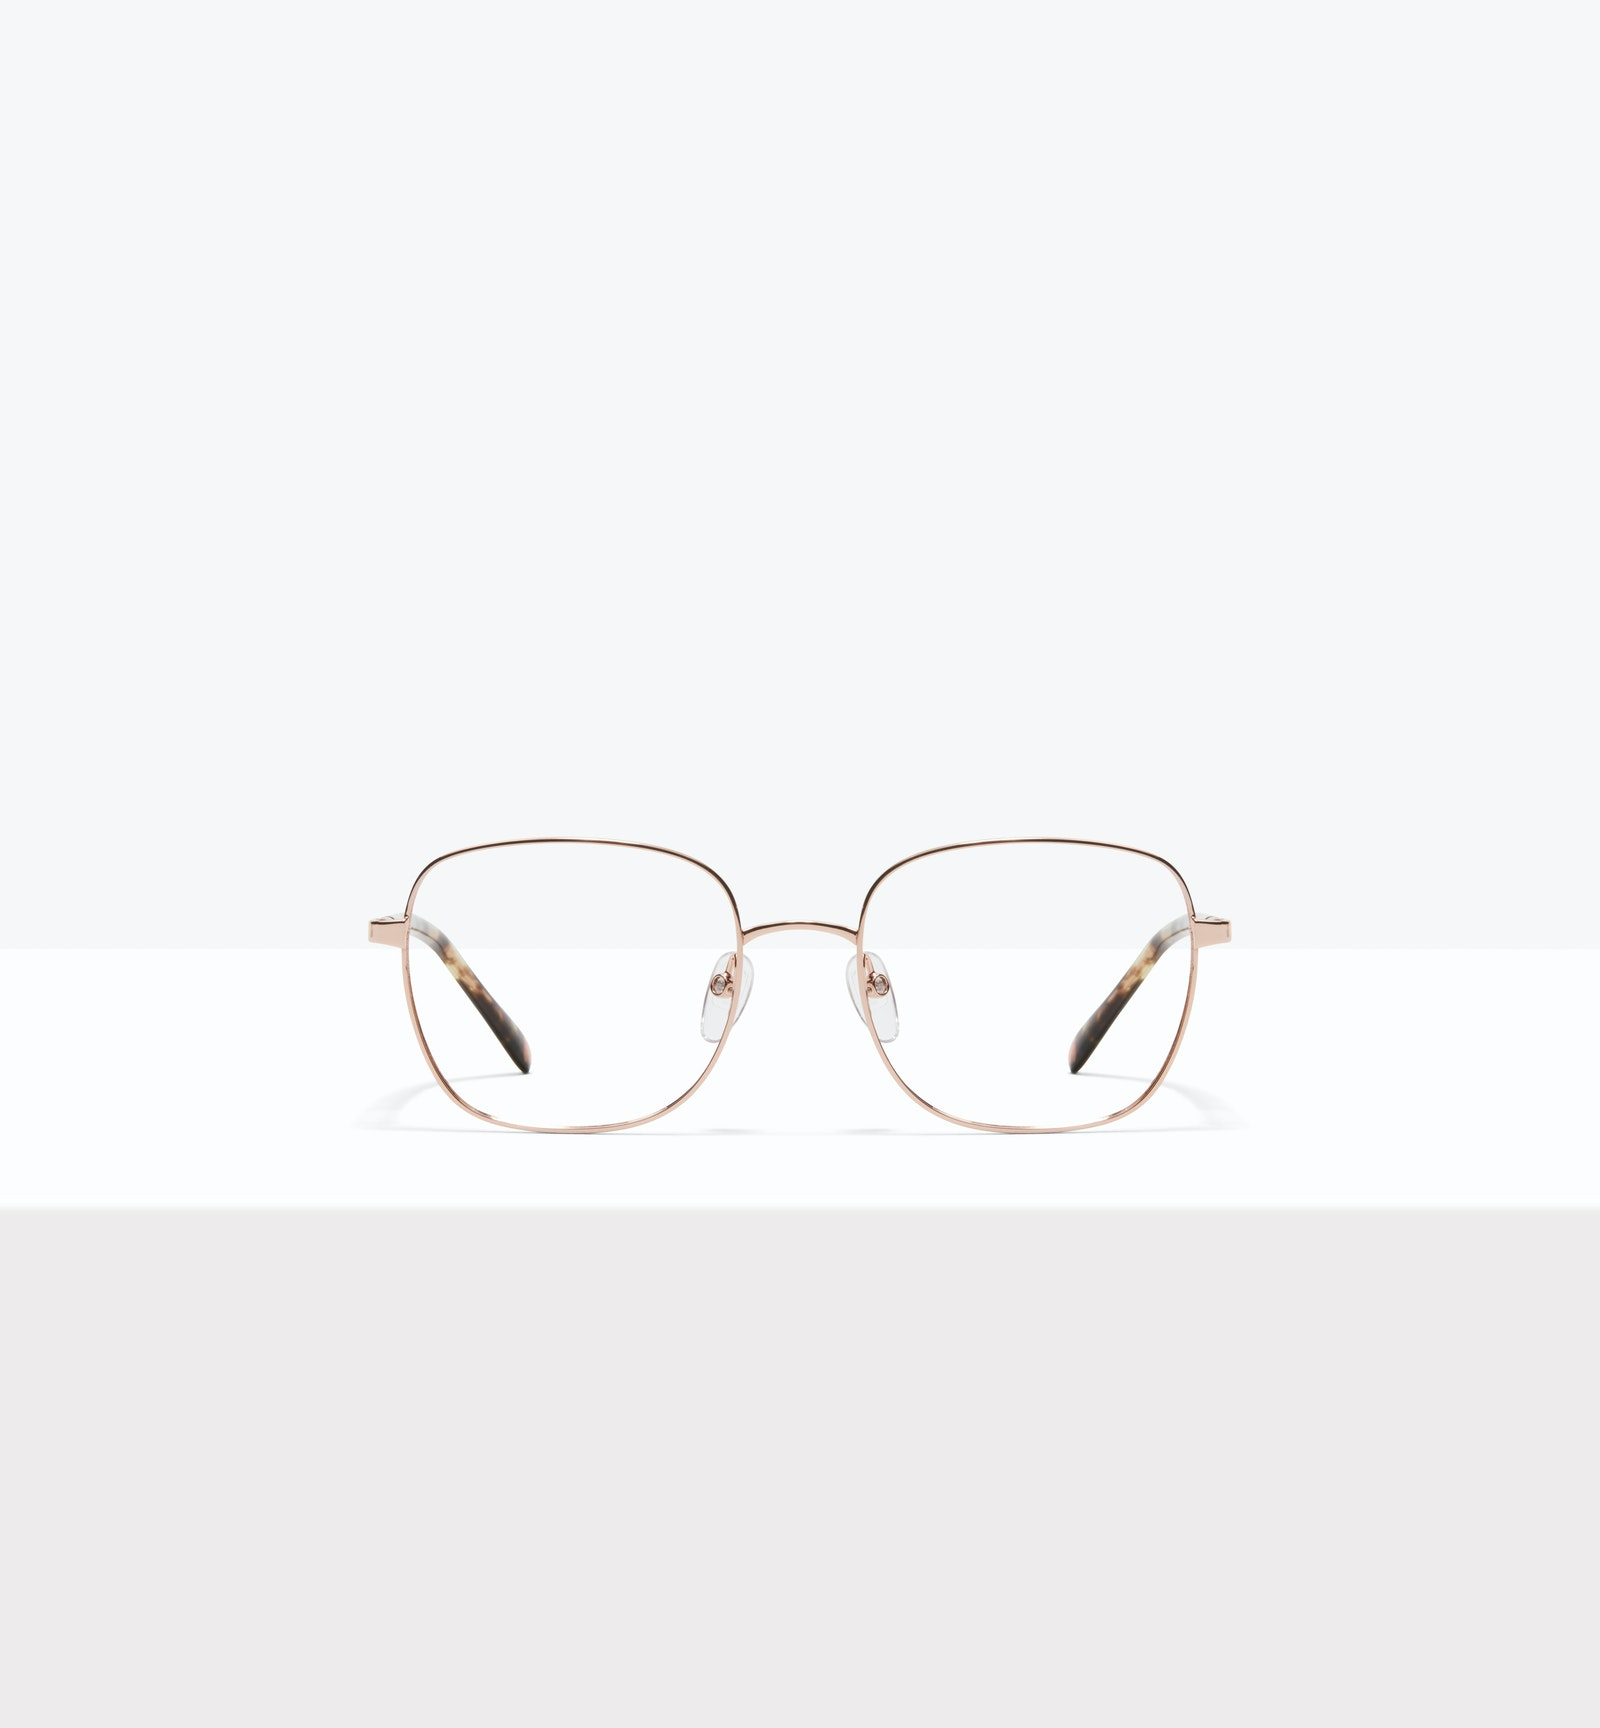 Affordable Fashion Glasses Square Eyeglasses Women Henriette M Rose Gold